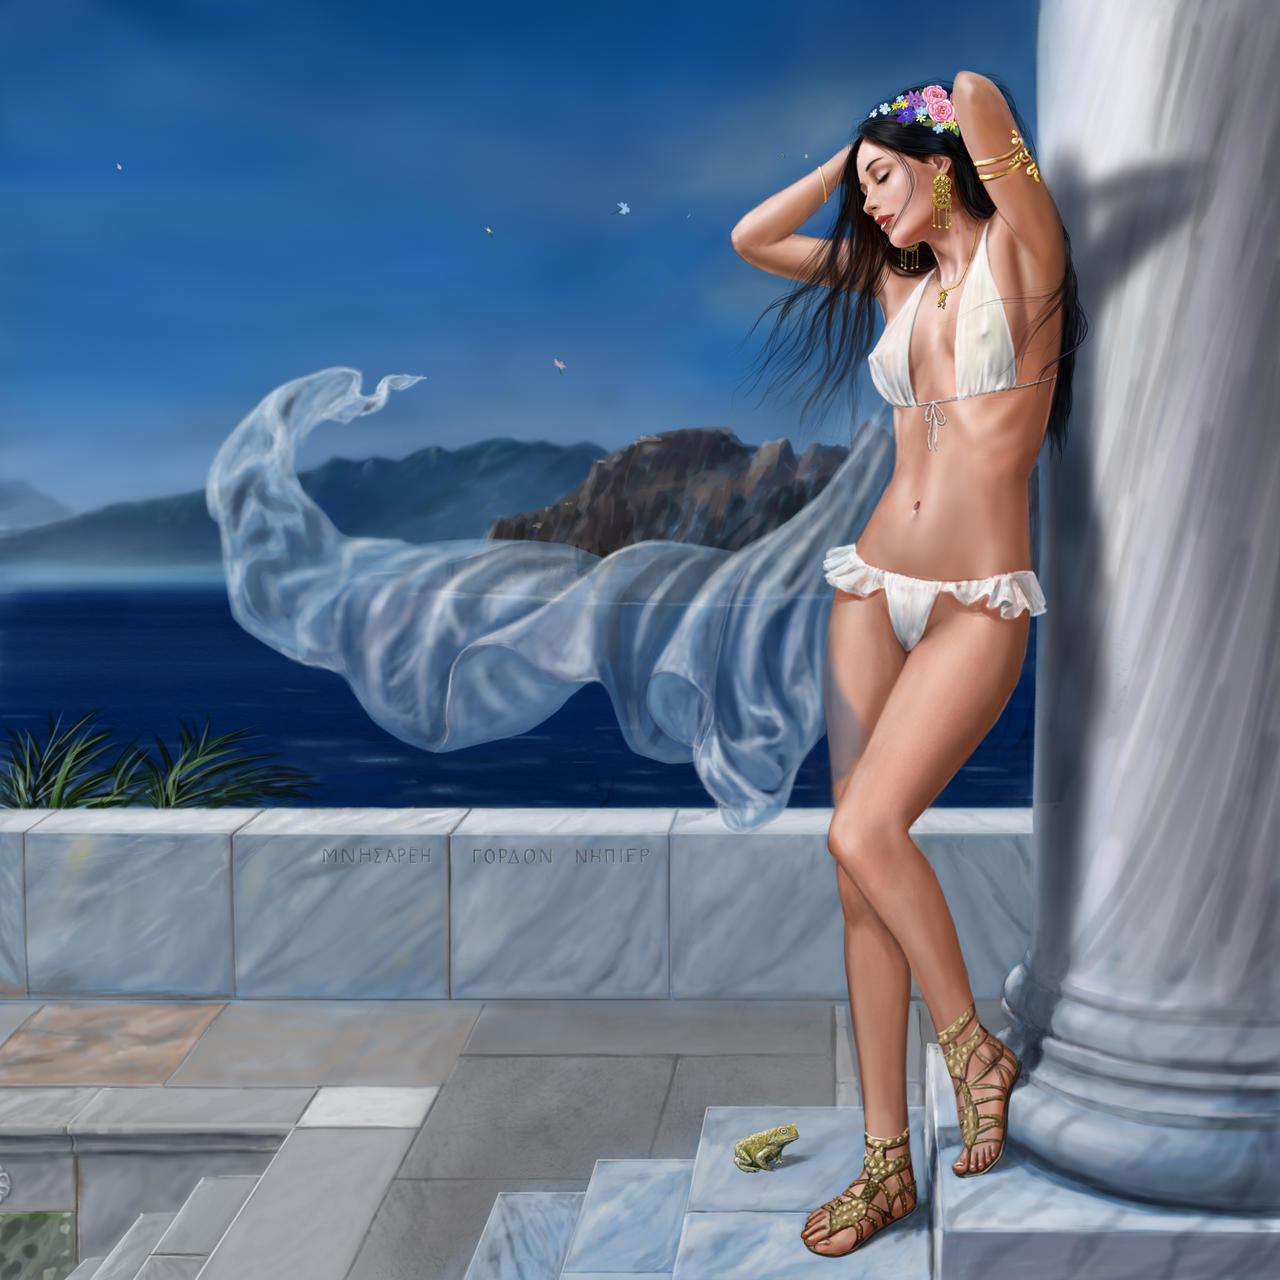 Sexy girl doing slefies 27mp4 9